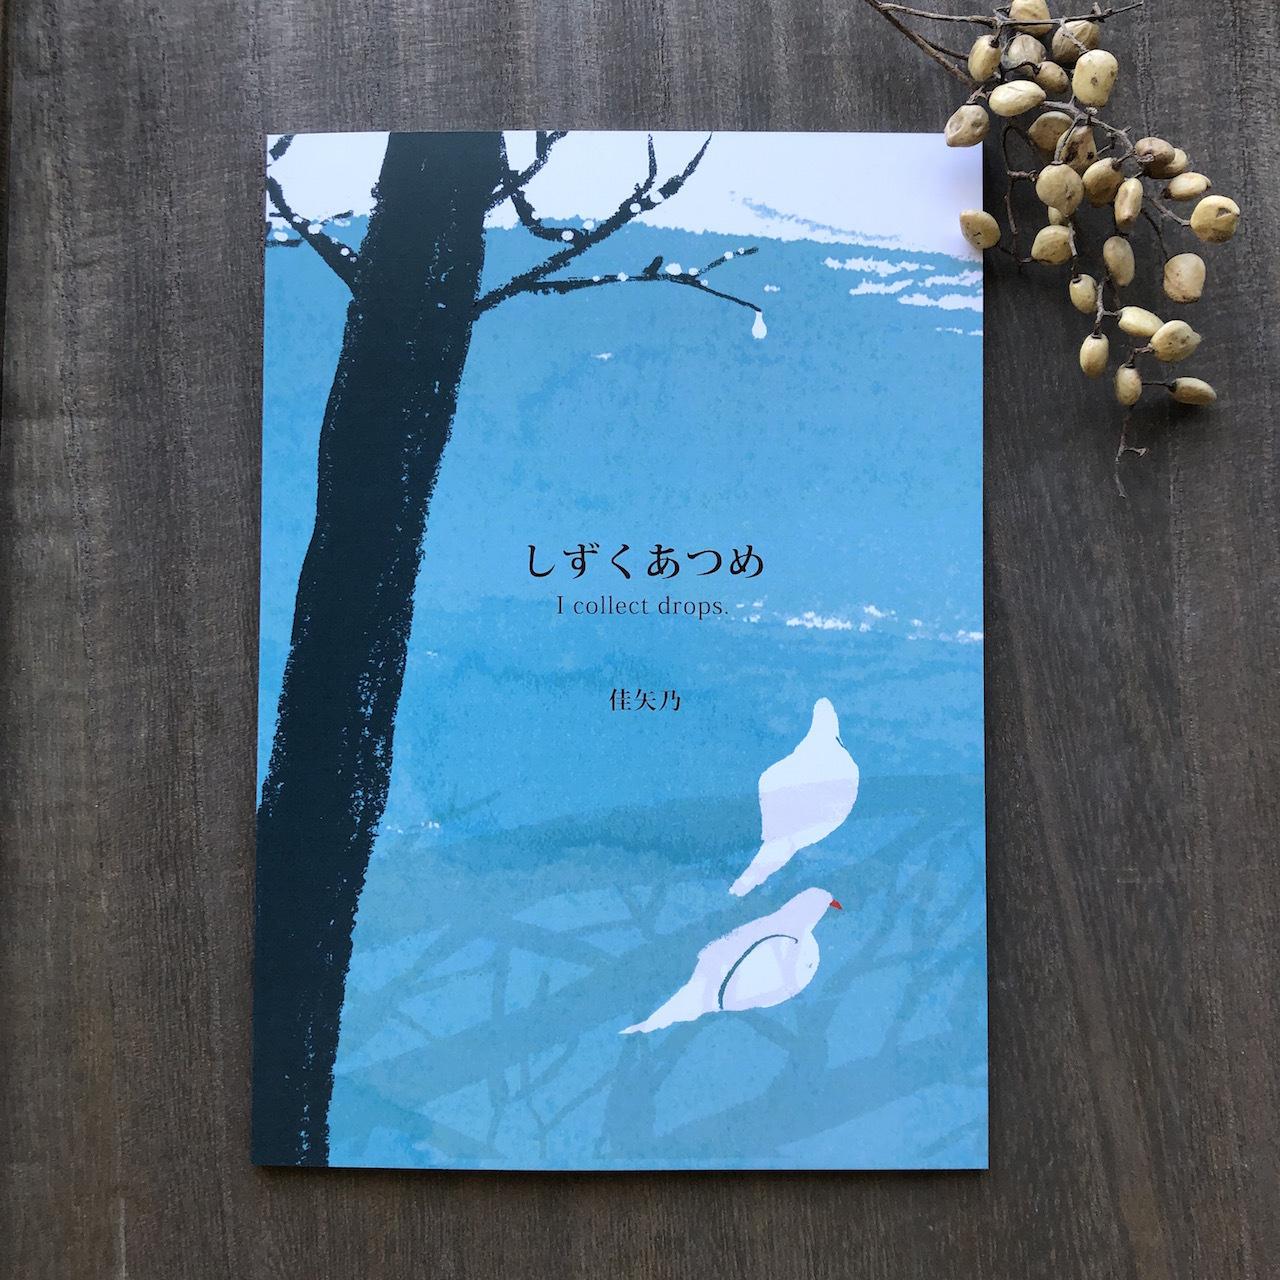 D-1 ZINE絵本「しずくあつめ」サイズ 縦18.2cm×横12.8cm(B6サイズ)32頁 ¥1,600(税込)